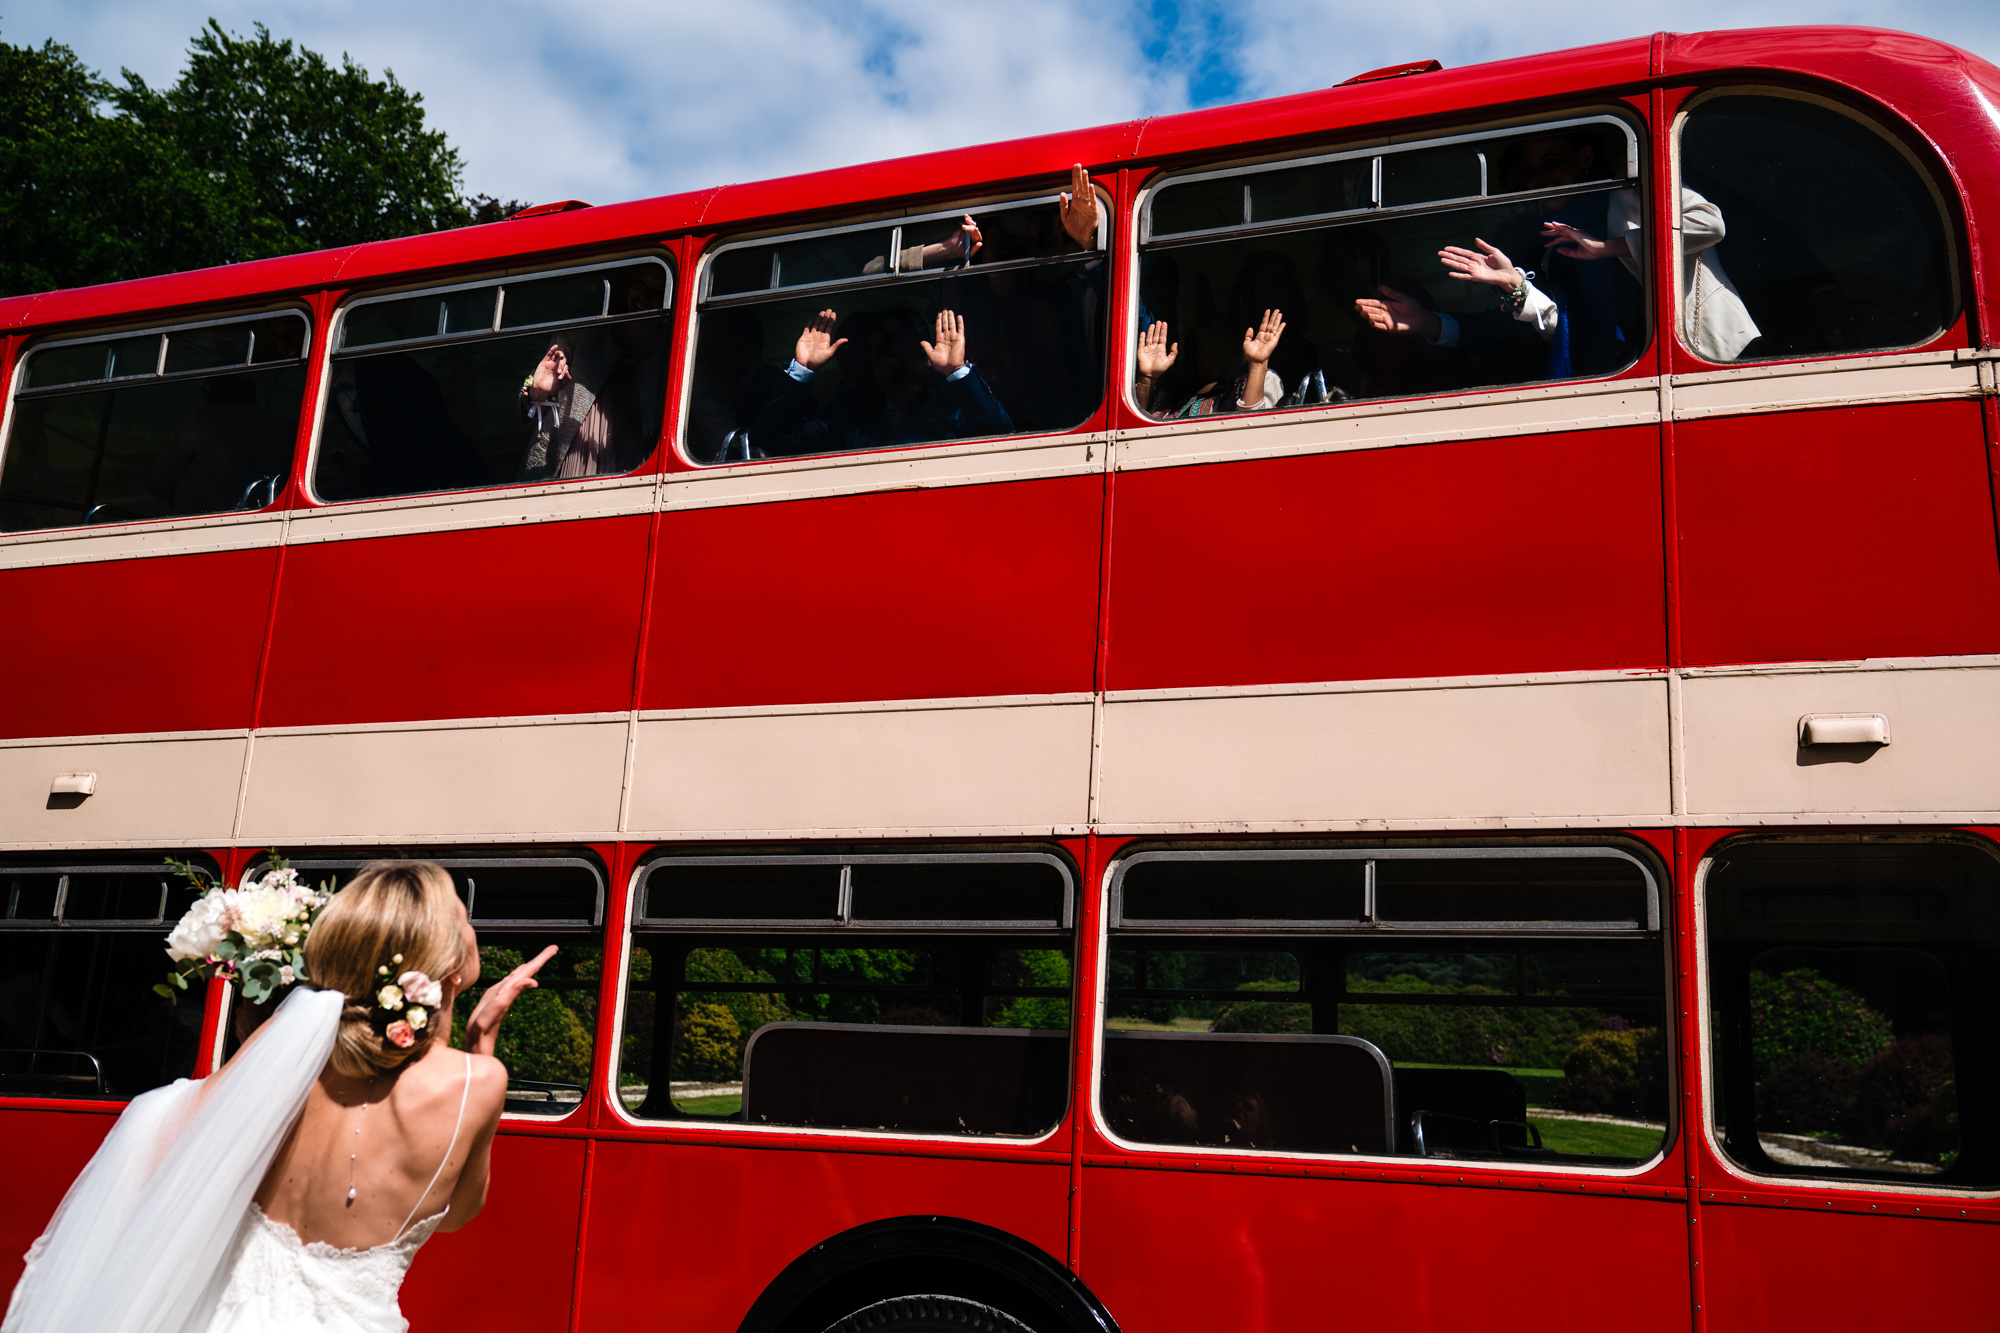 bride-ways-goodbye-to-guest-in-double-decker-bus-worlds-best-wedding-photos-yves-schepers-belgium-wedding-photographers